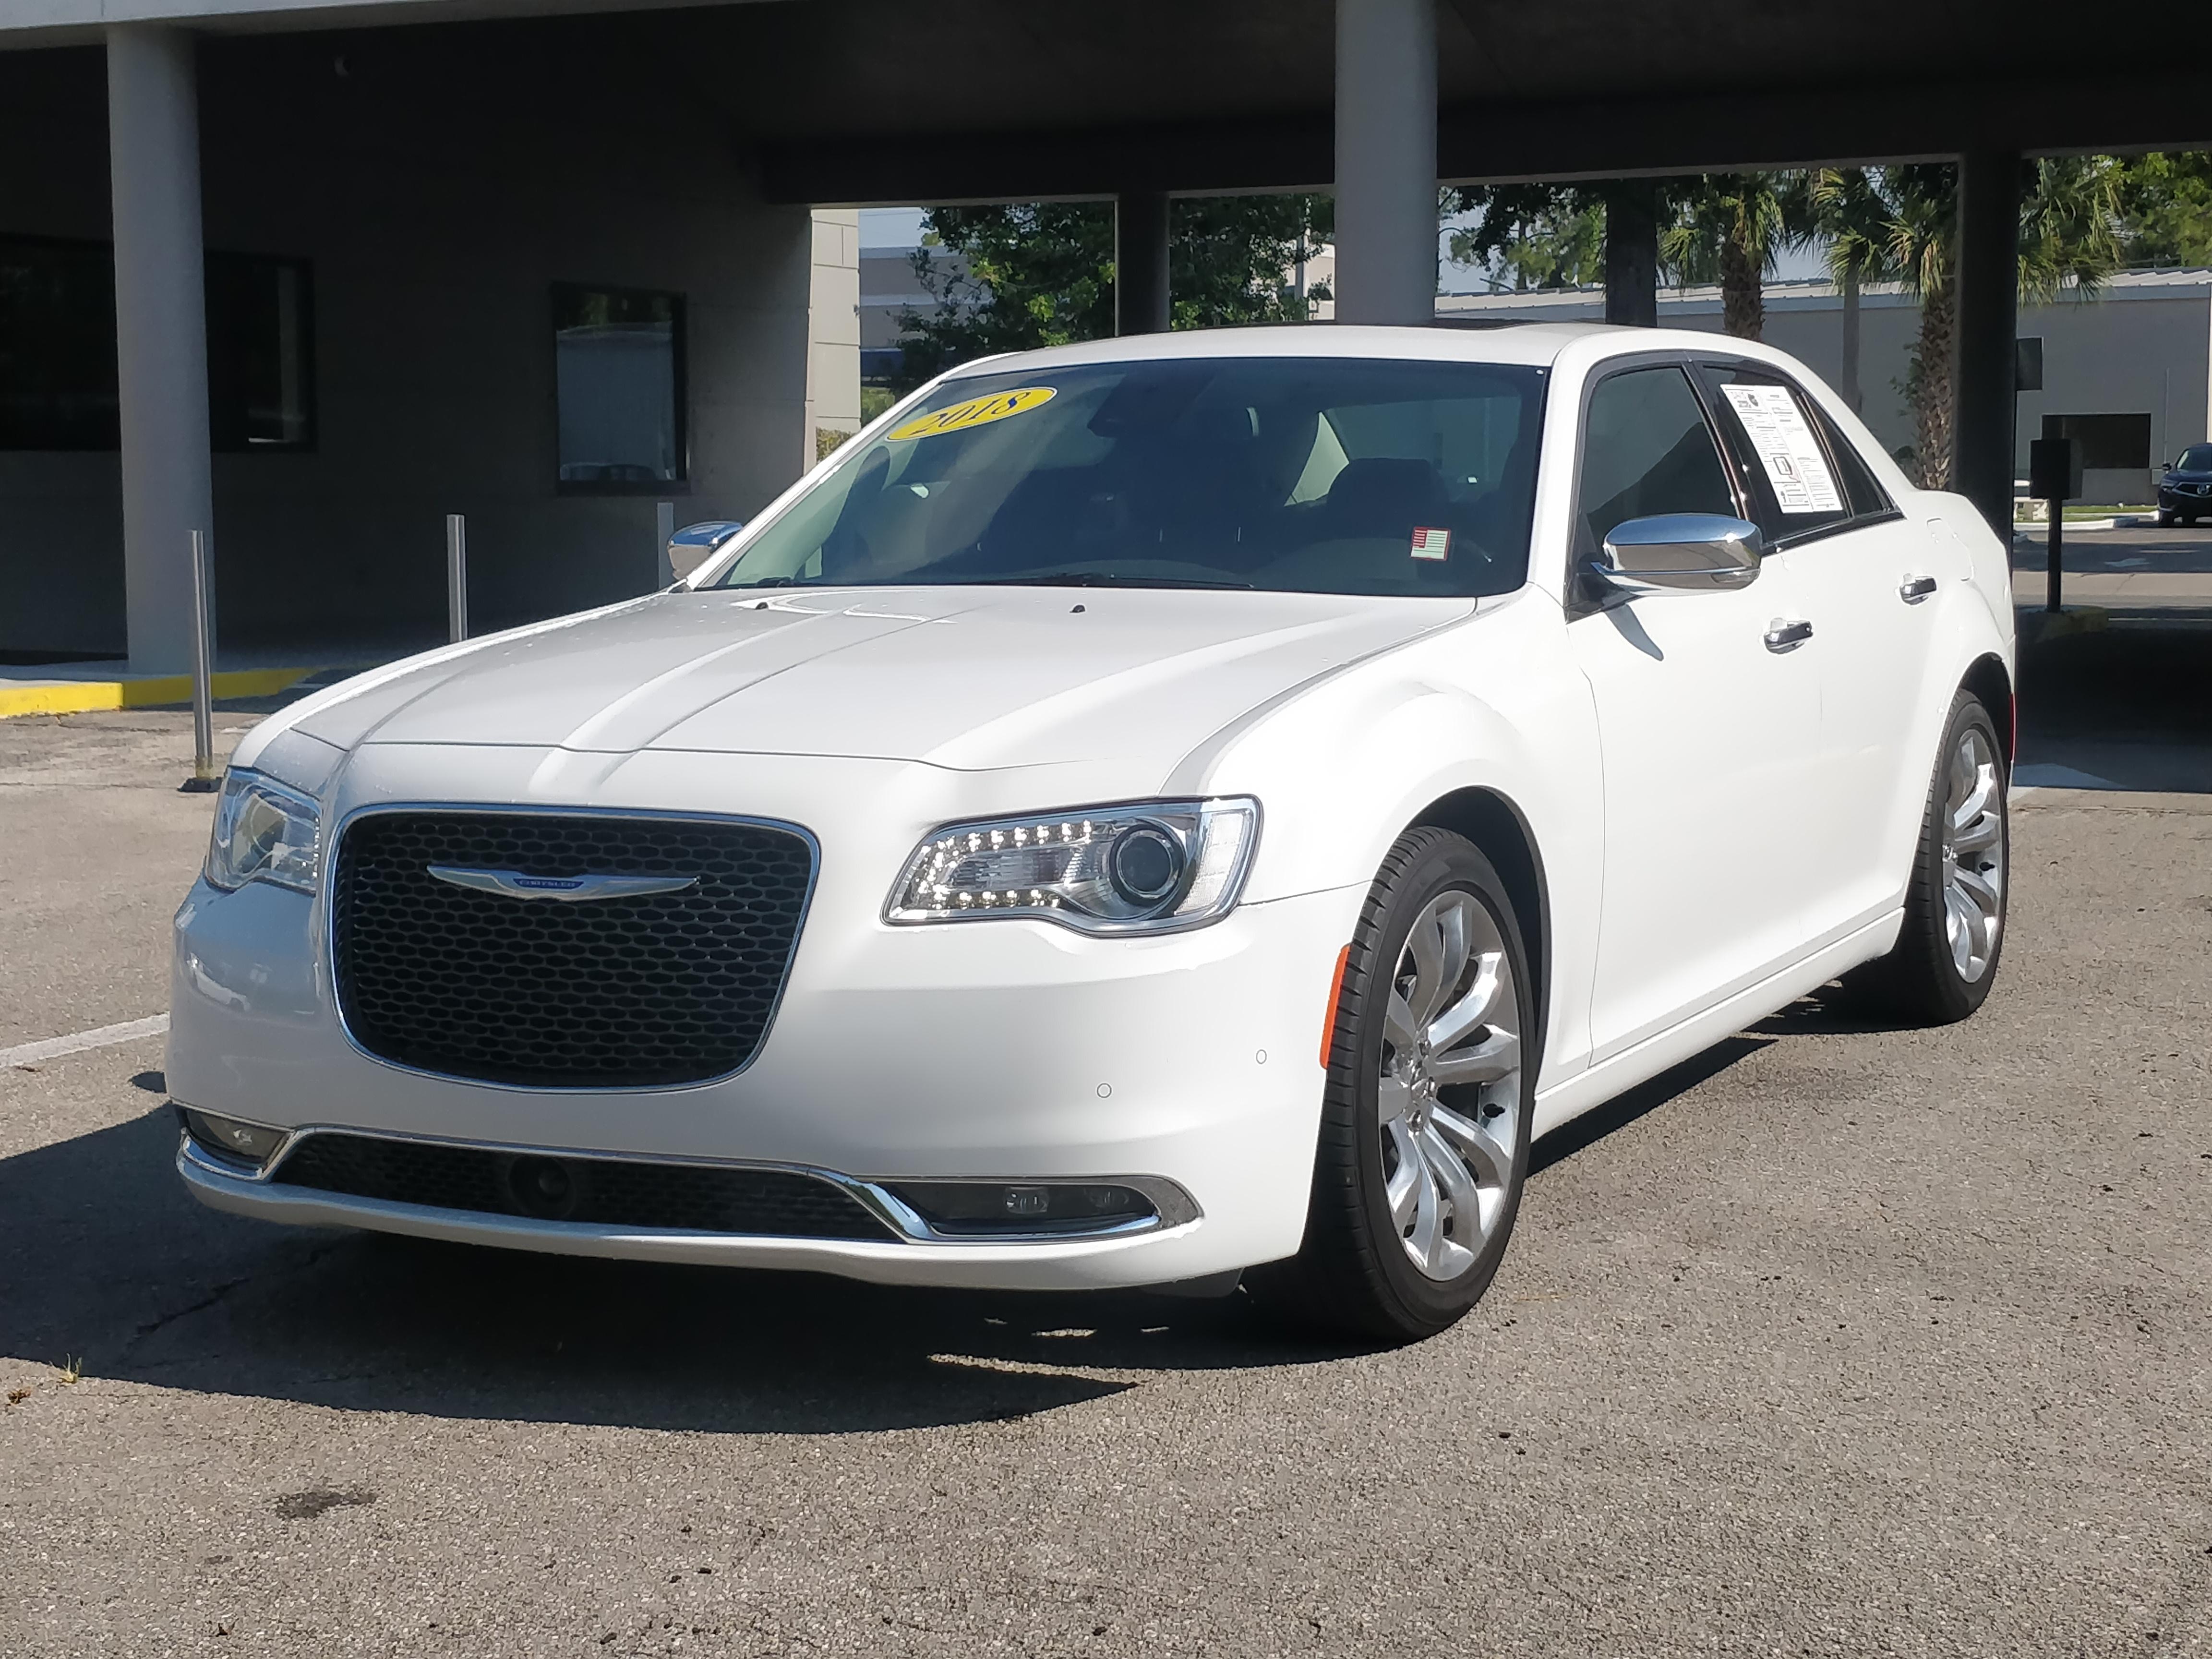 2018 Chrysler 300 Limited – Fully Loaded